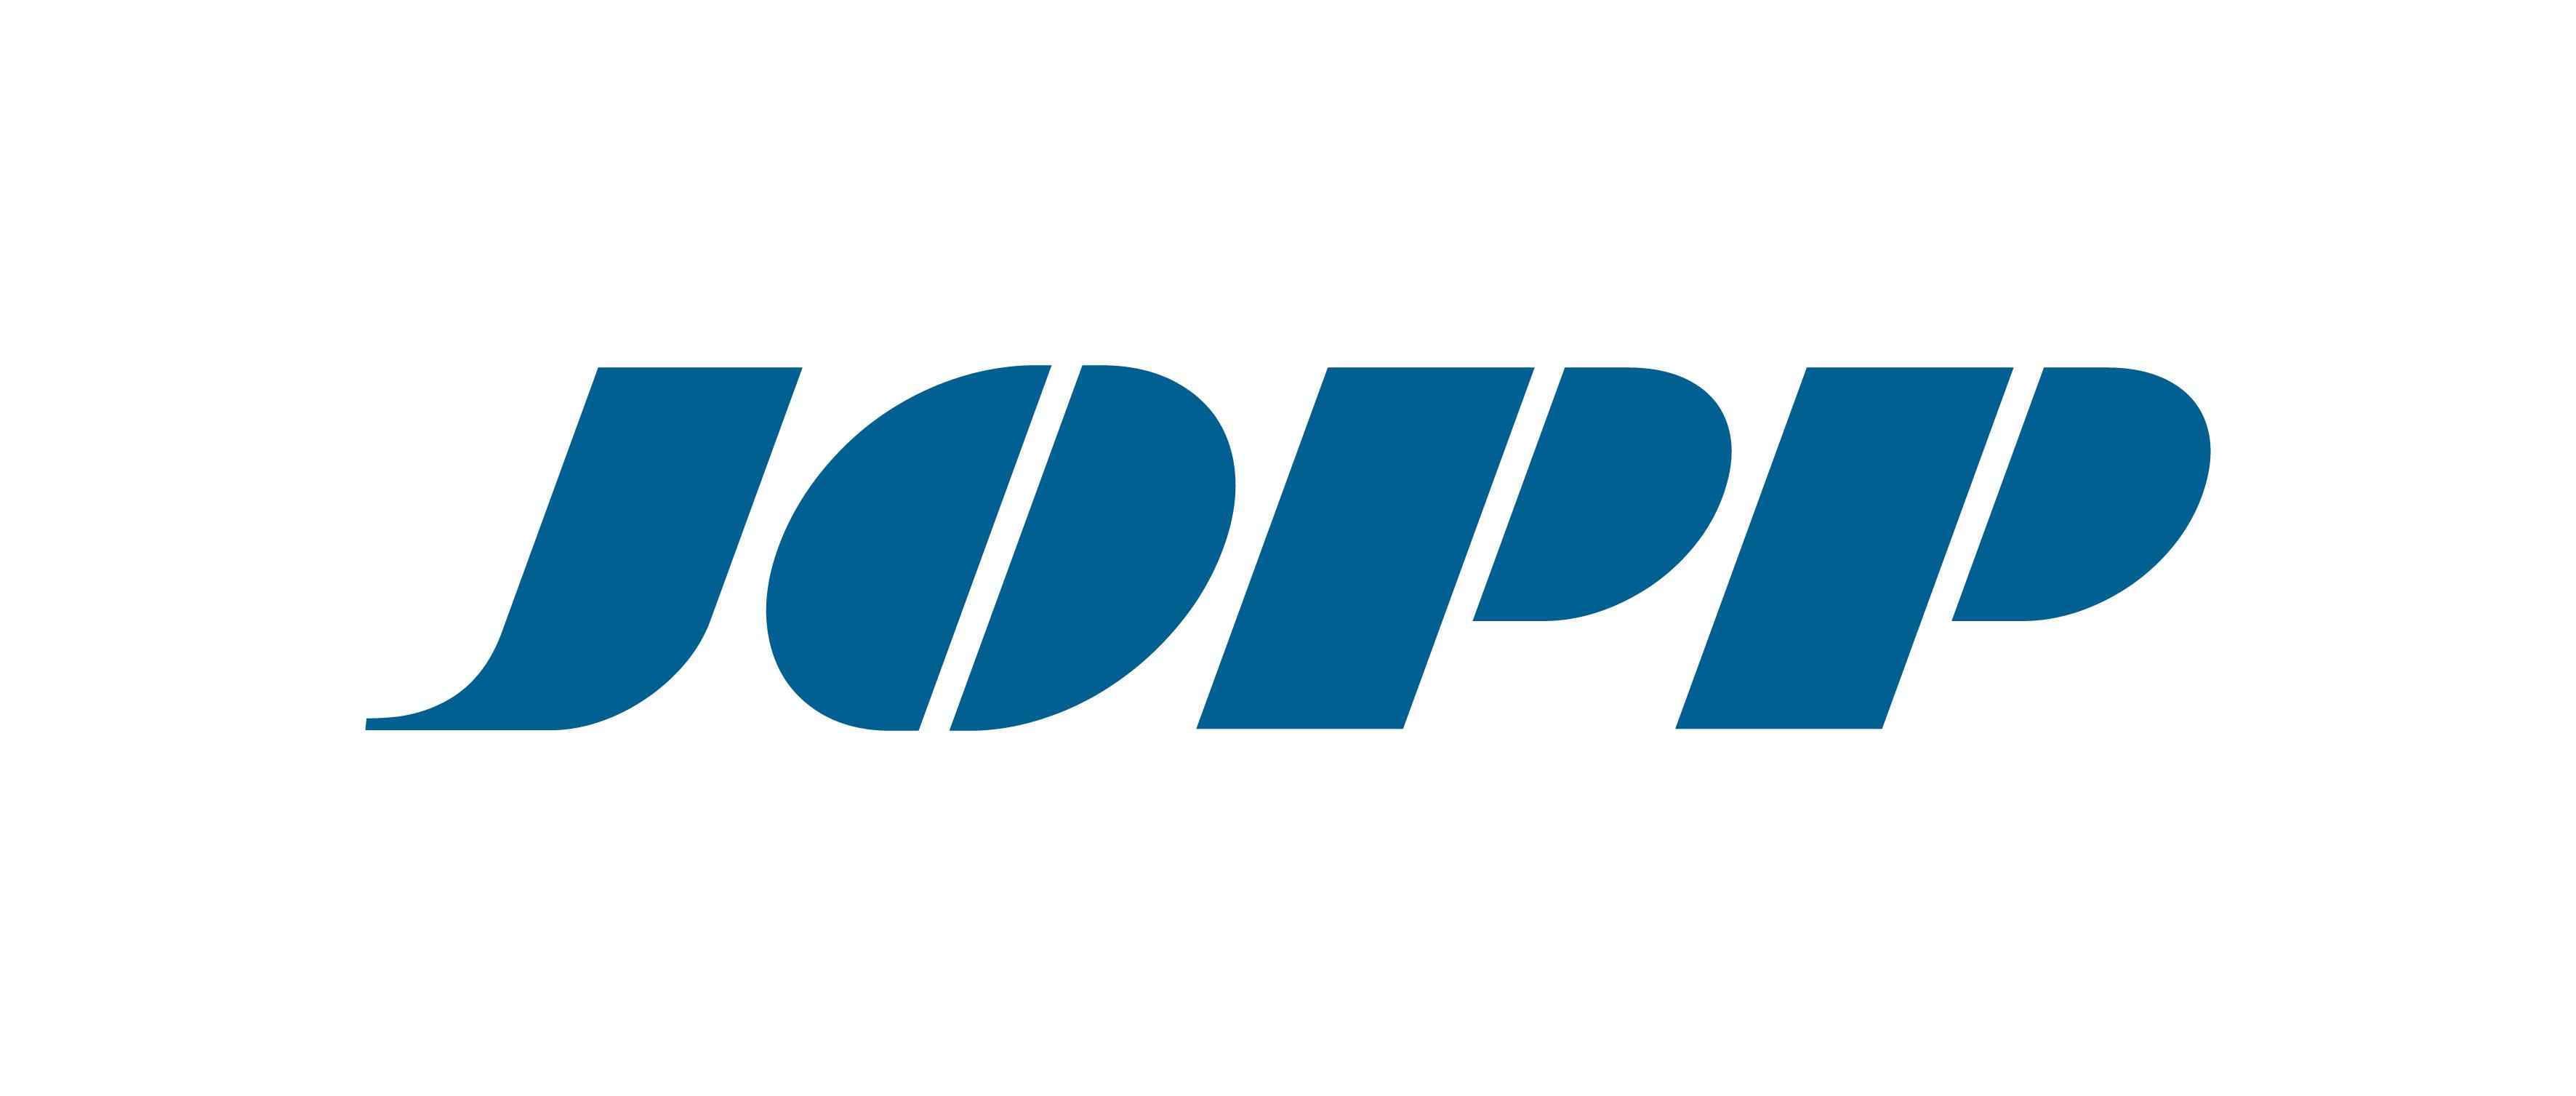 JOPP_rgb_blue.jpg